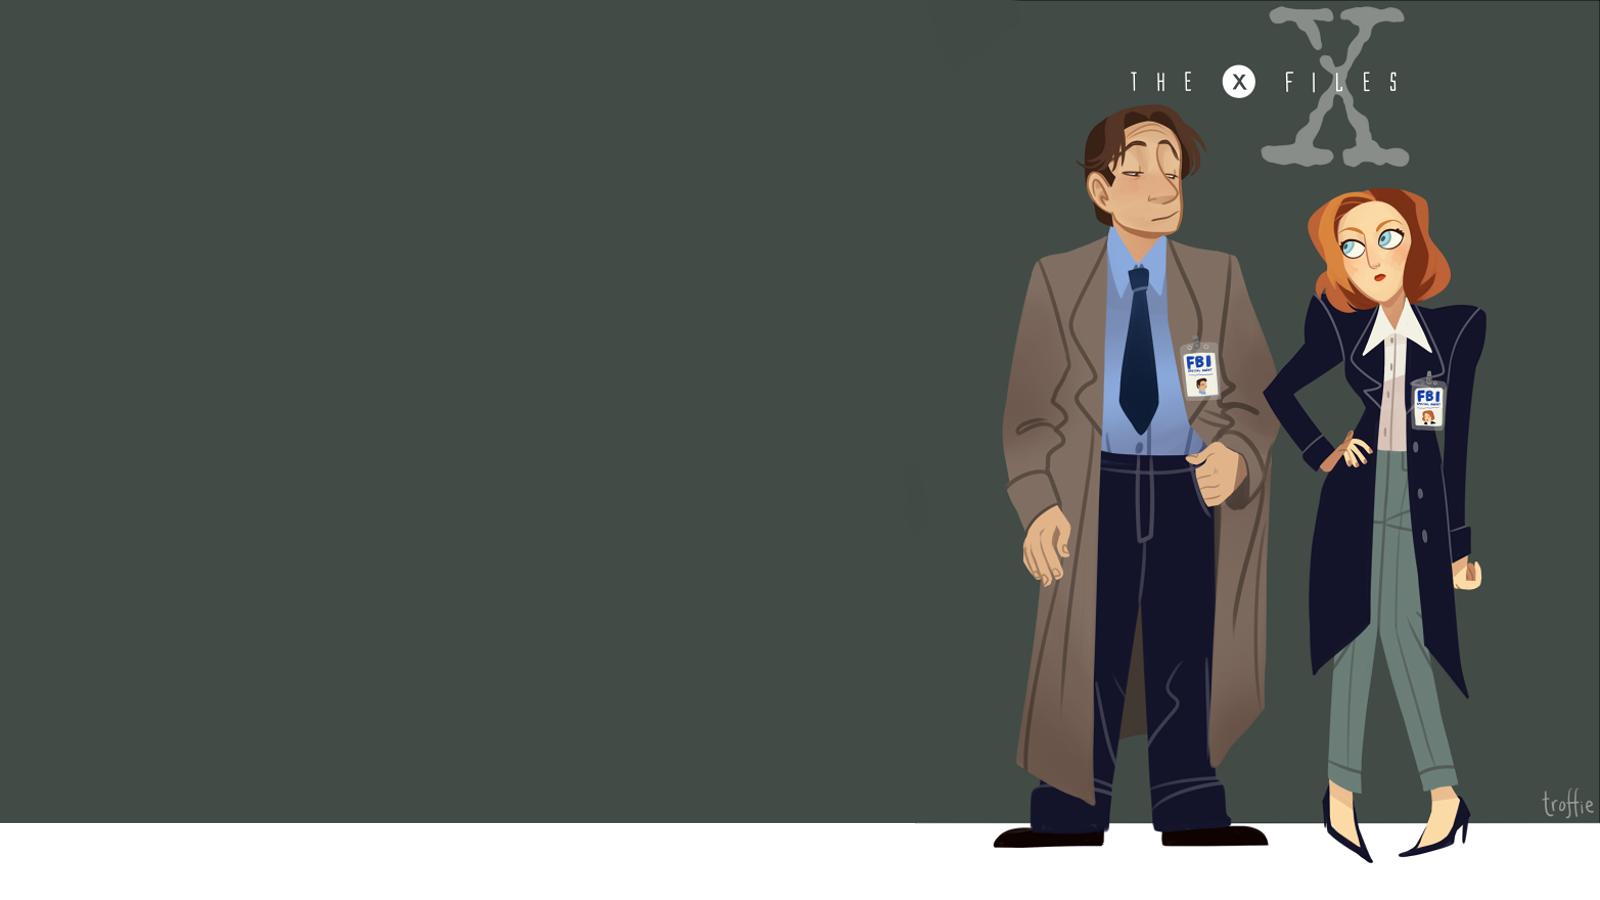 General 1600x900 digital art simple background The X-Files Dana Scully Fox Mulder cartoon fan art TV Series